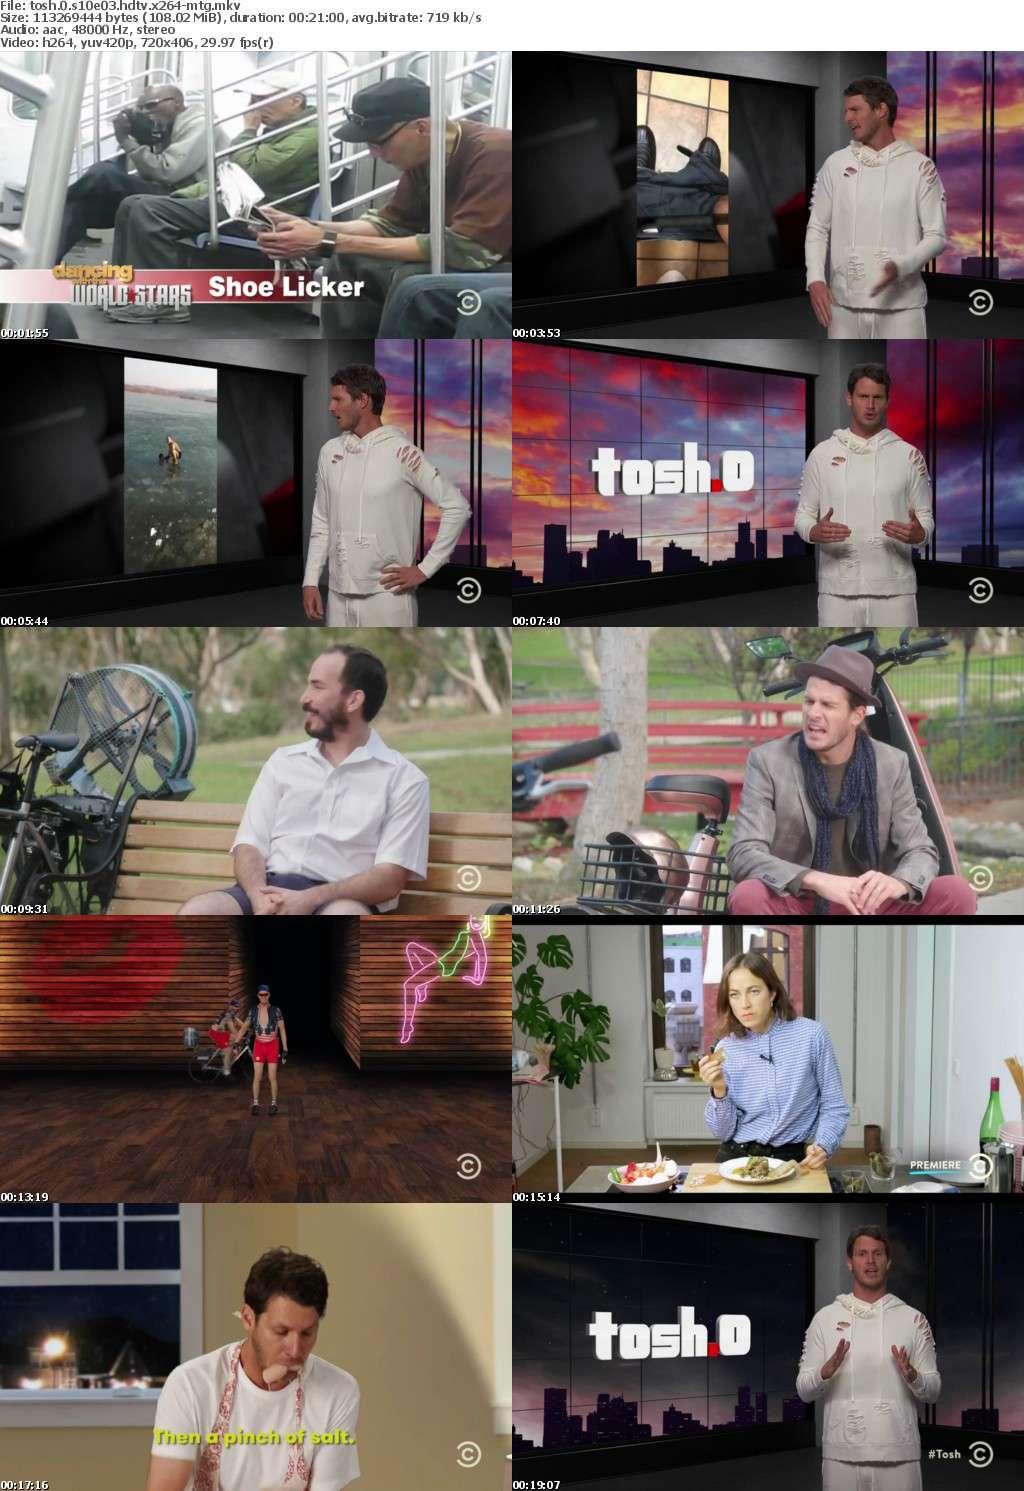 Tosh 0 S10E03 HDTV x264-MiNDTHEGAP